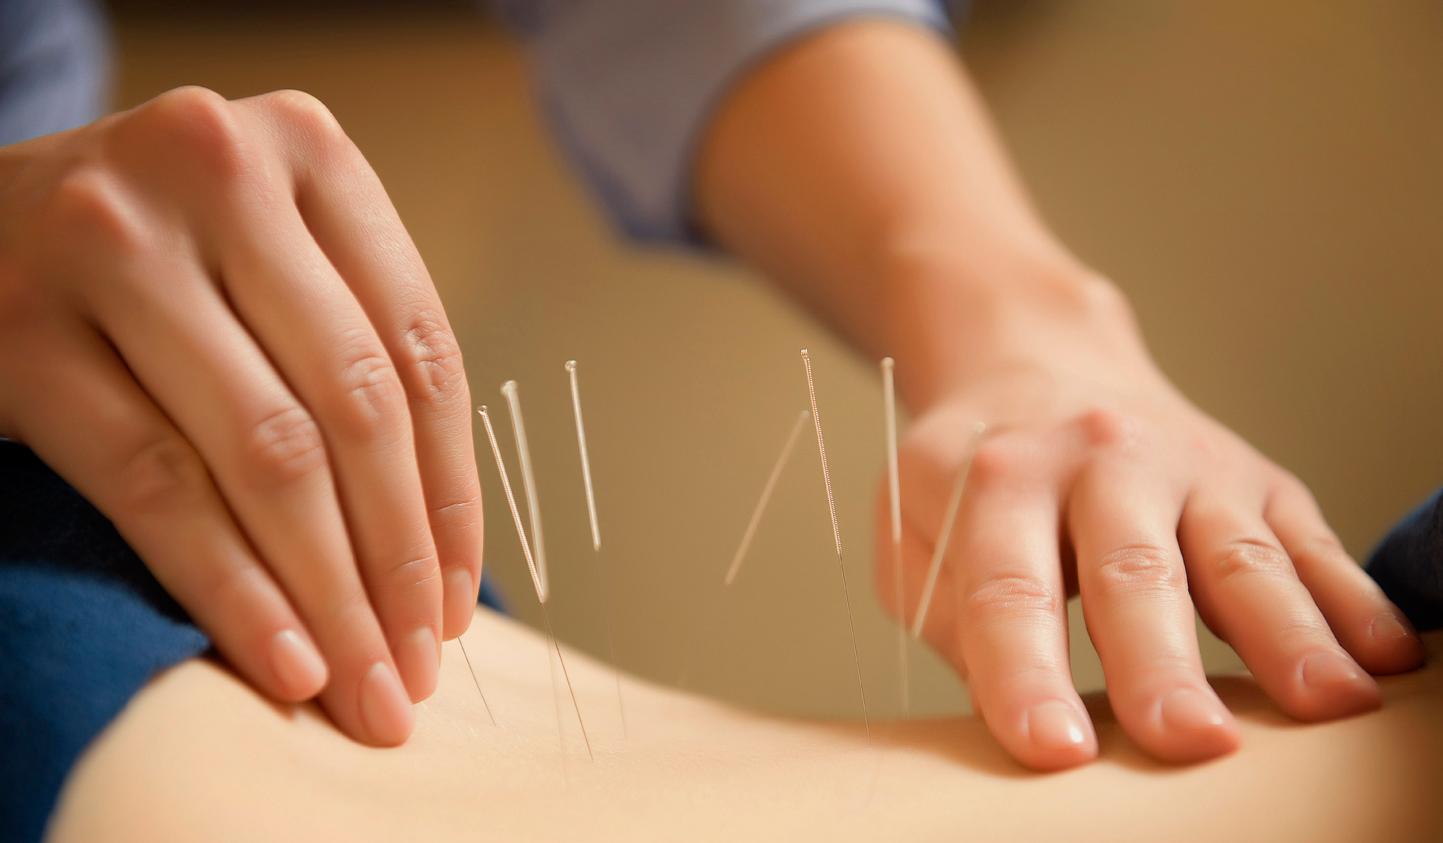 5 Natural Neuropathy Treatments